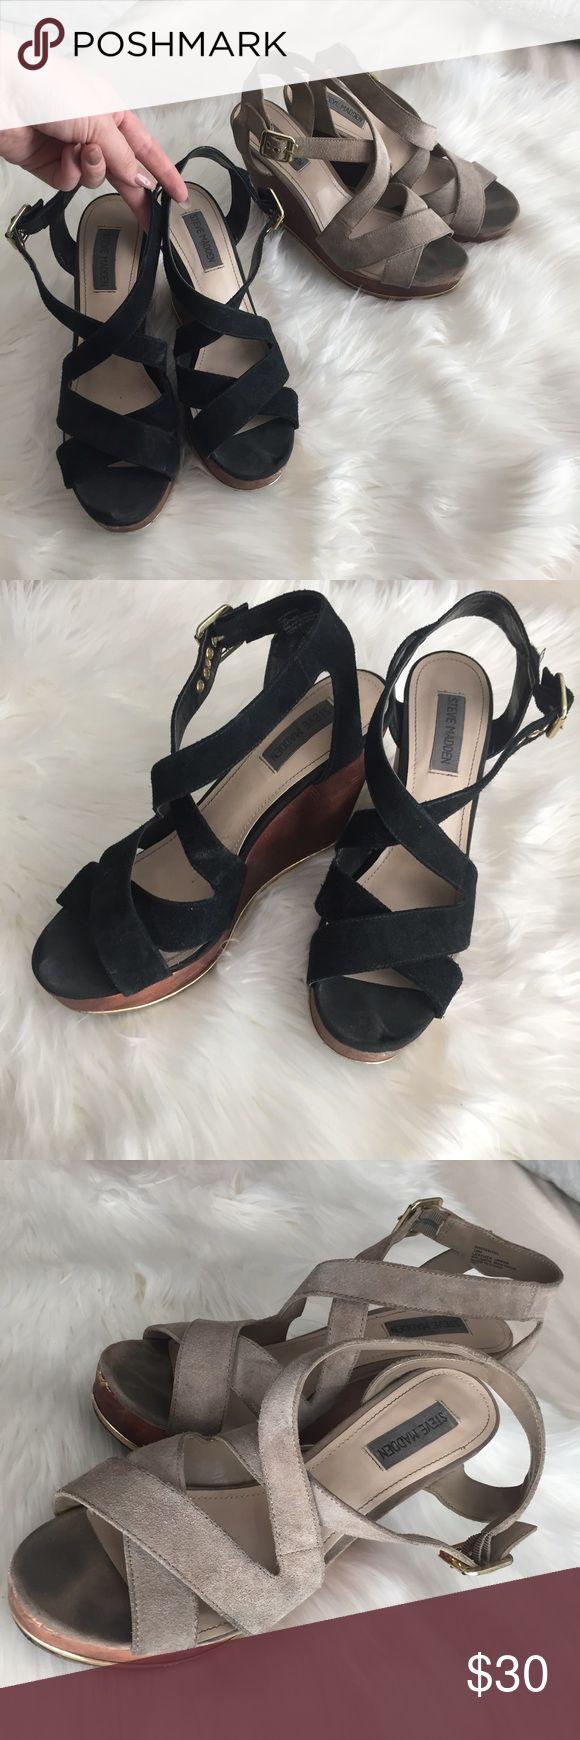 Steve Madden Tan and Black Wedge Sandals 2 Pairs 1 inch platform. 4 inch heel Steve Madden Shoes Wedges